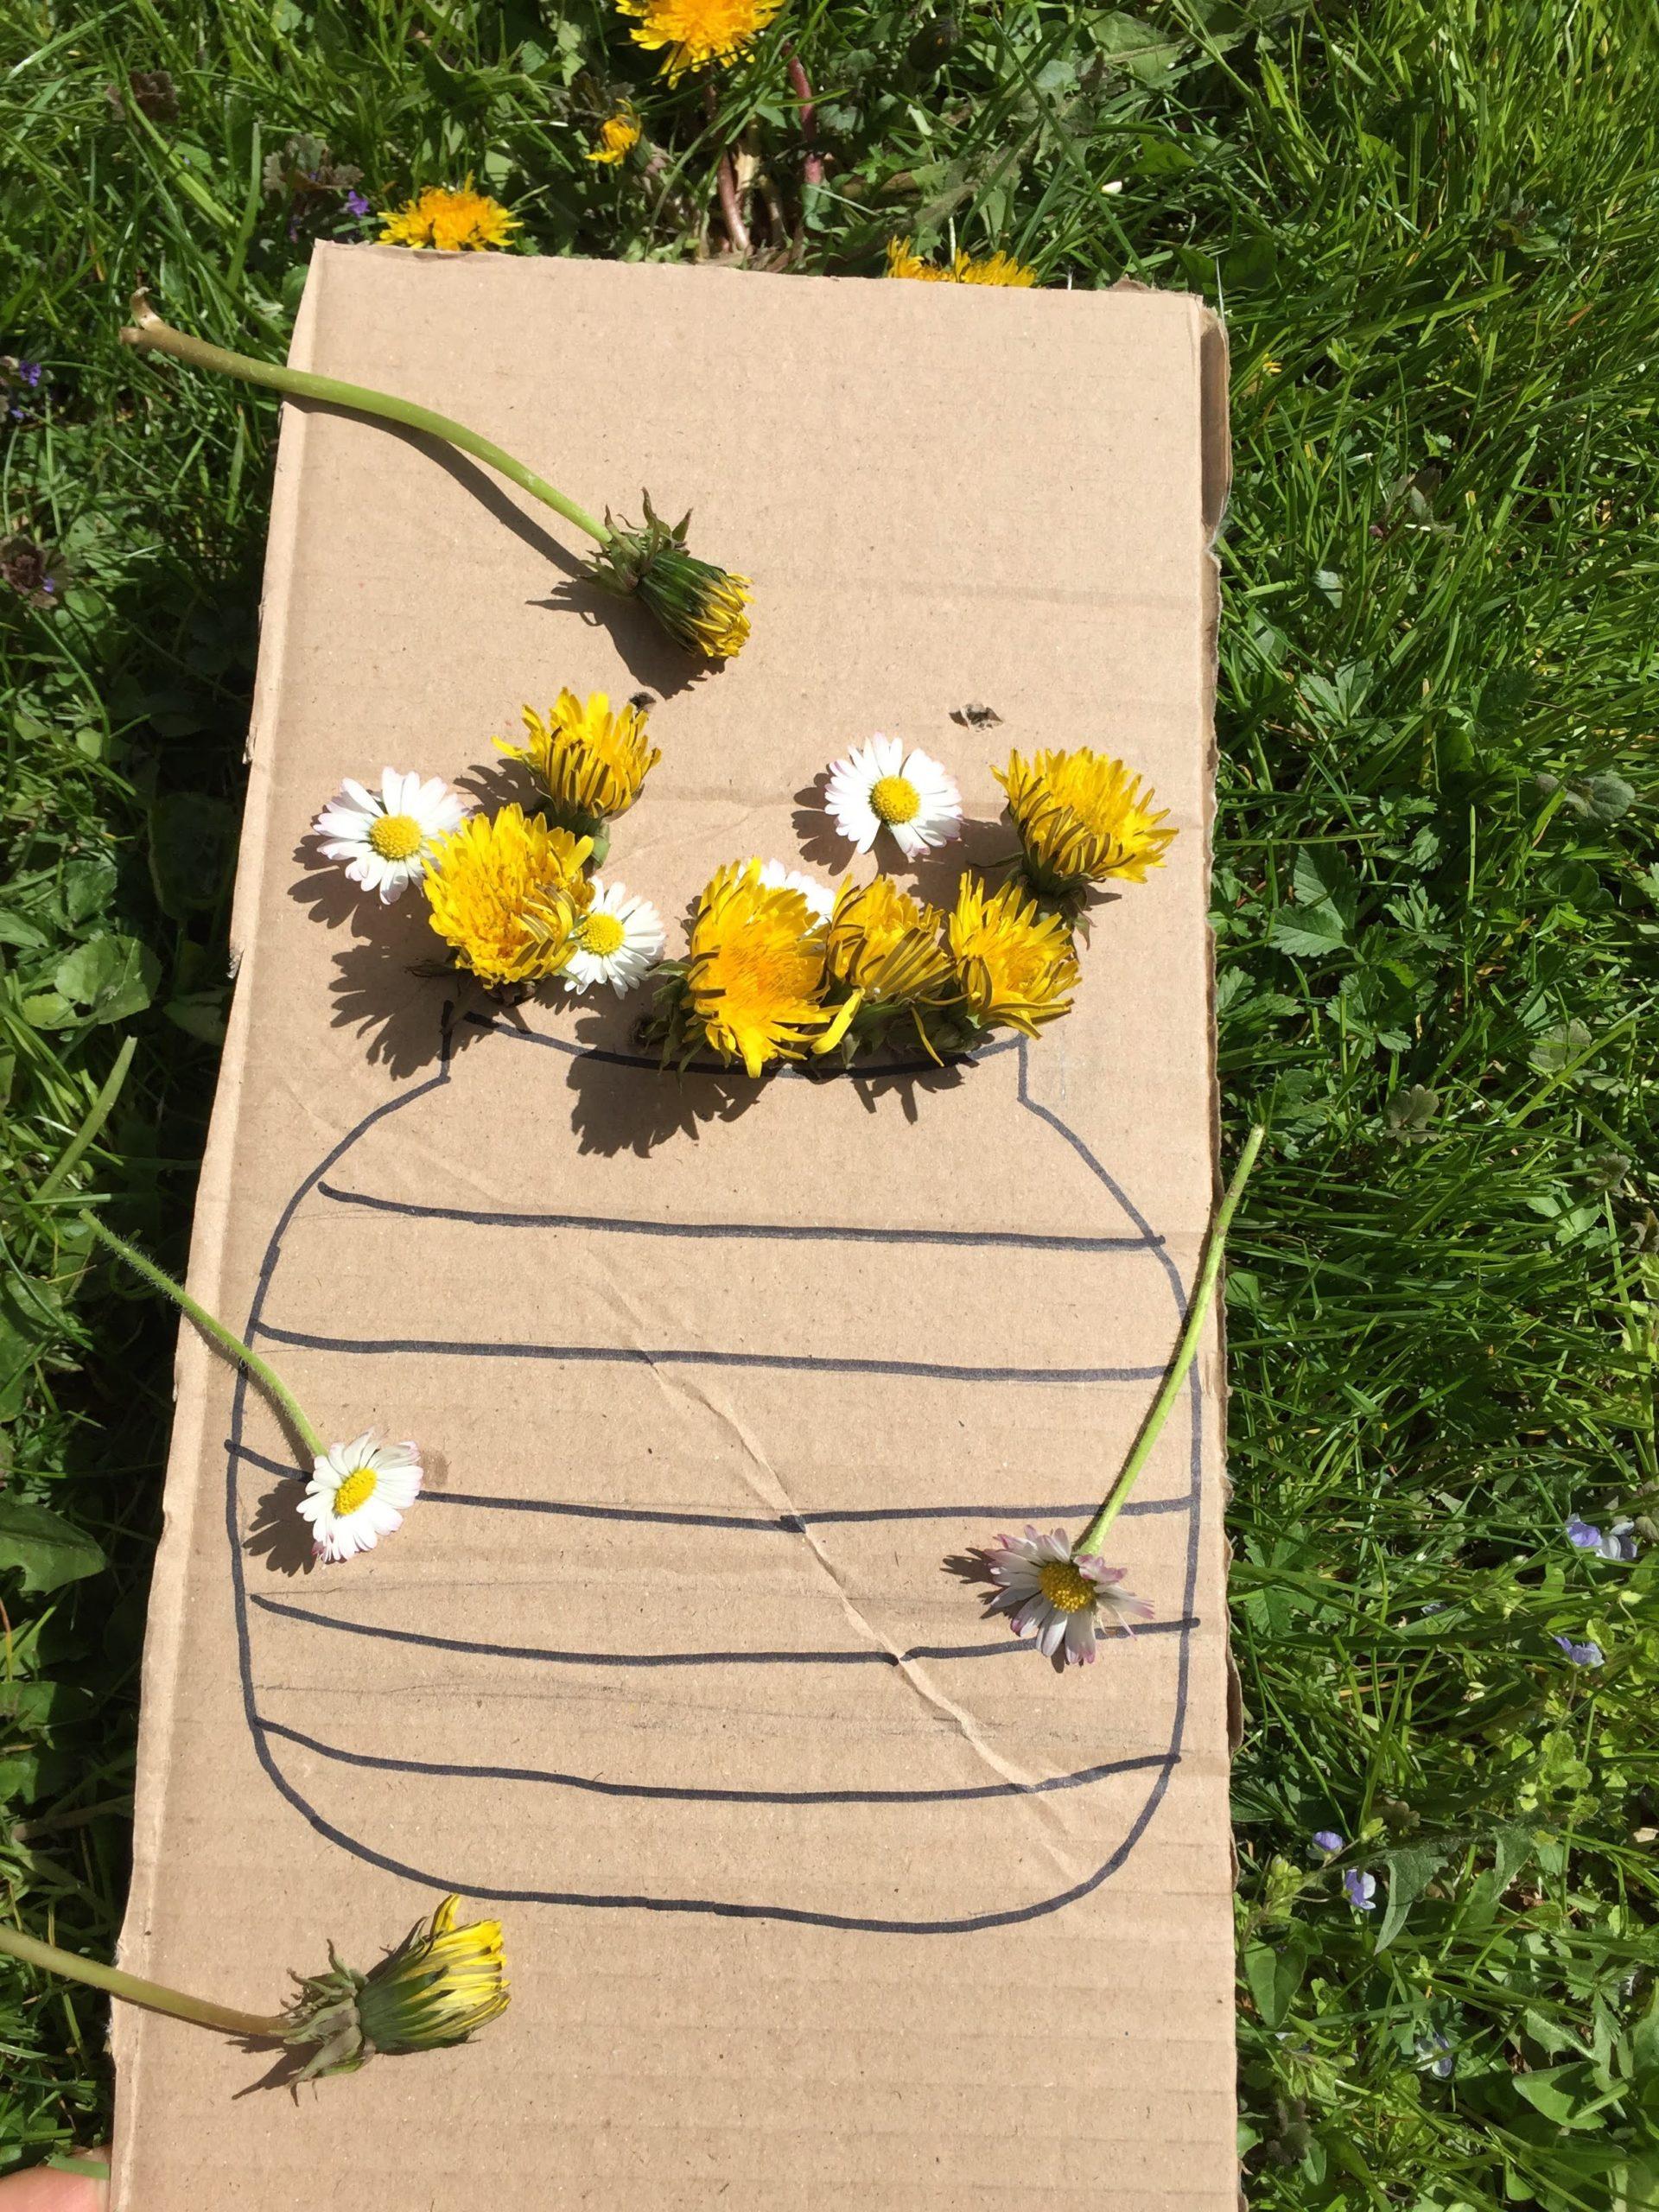 Bastelvorlage Blumenvase im Frühling